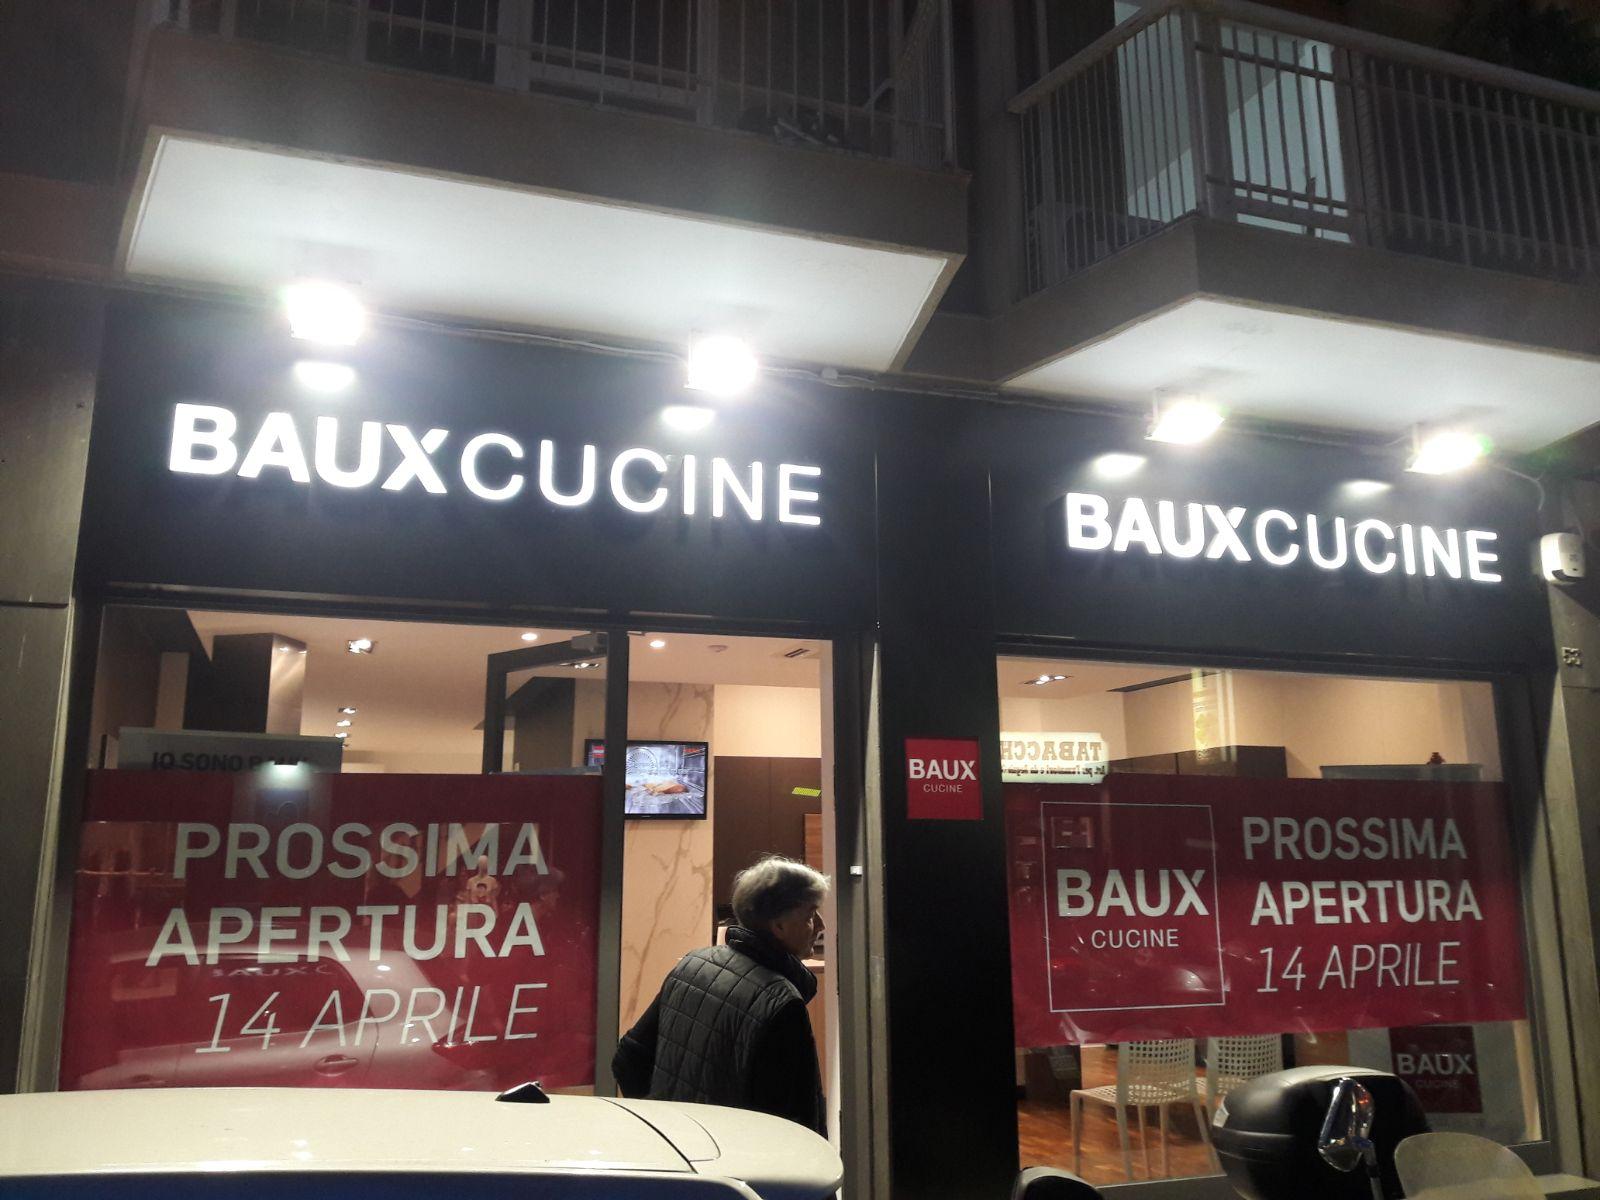 BAUX CUCINE